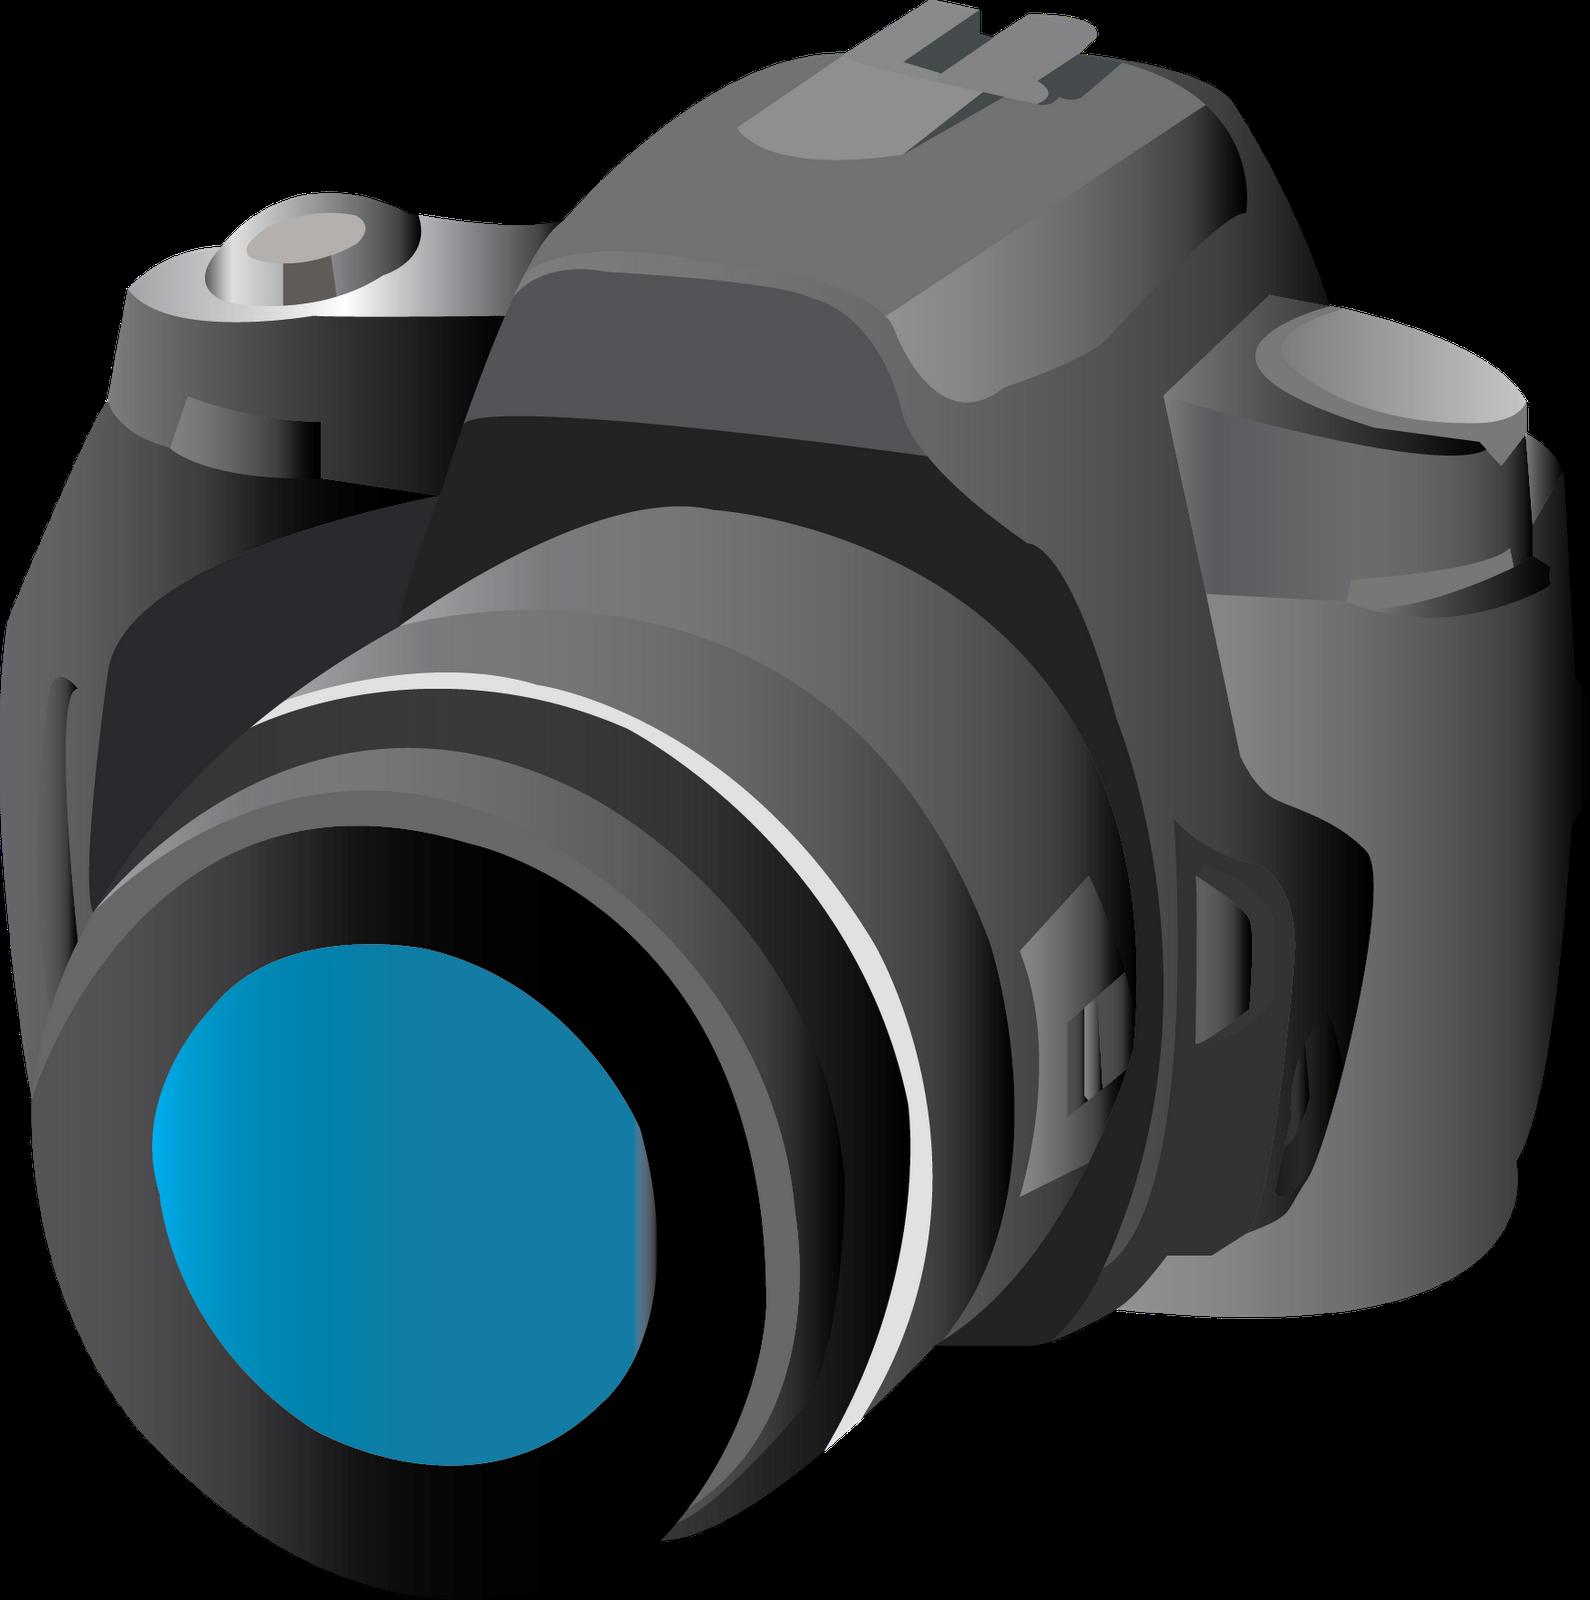 Free Slr Camera Cliparts, Download Free Clip Art, Free Clip.